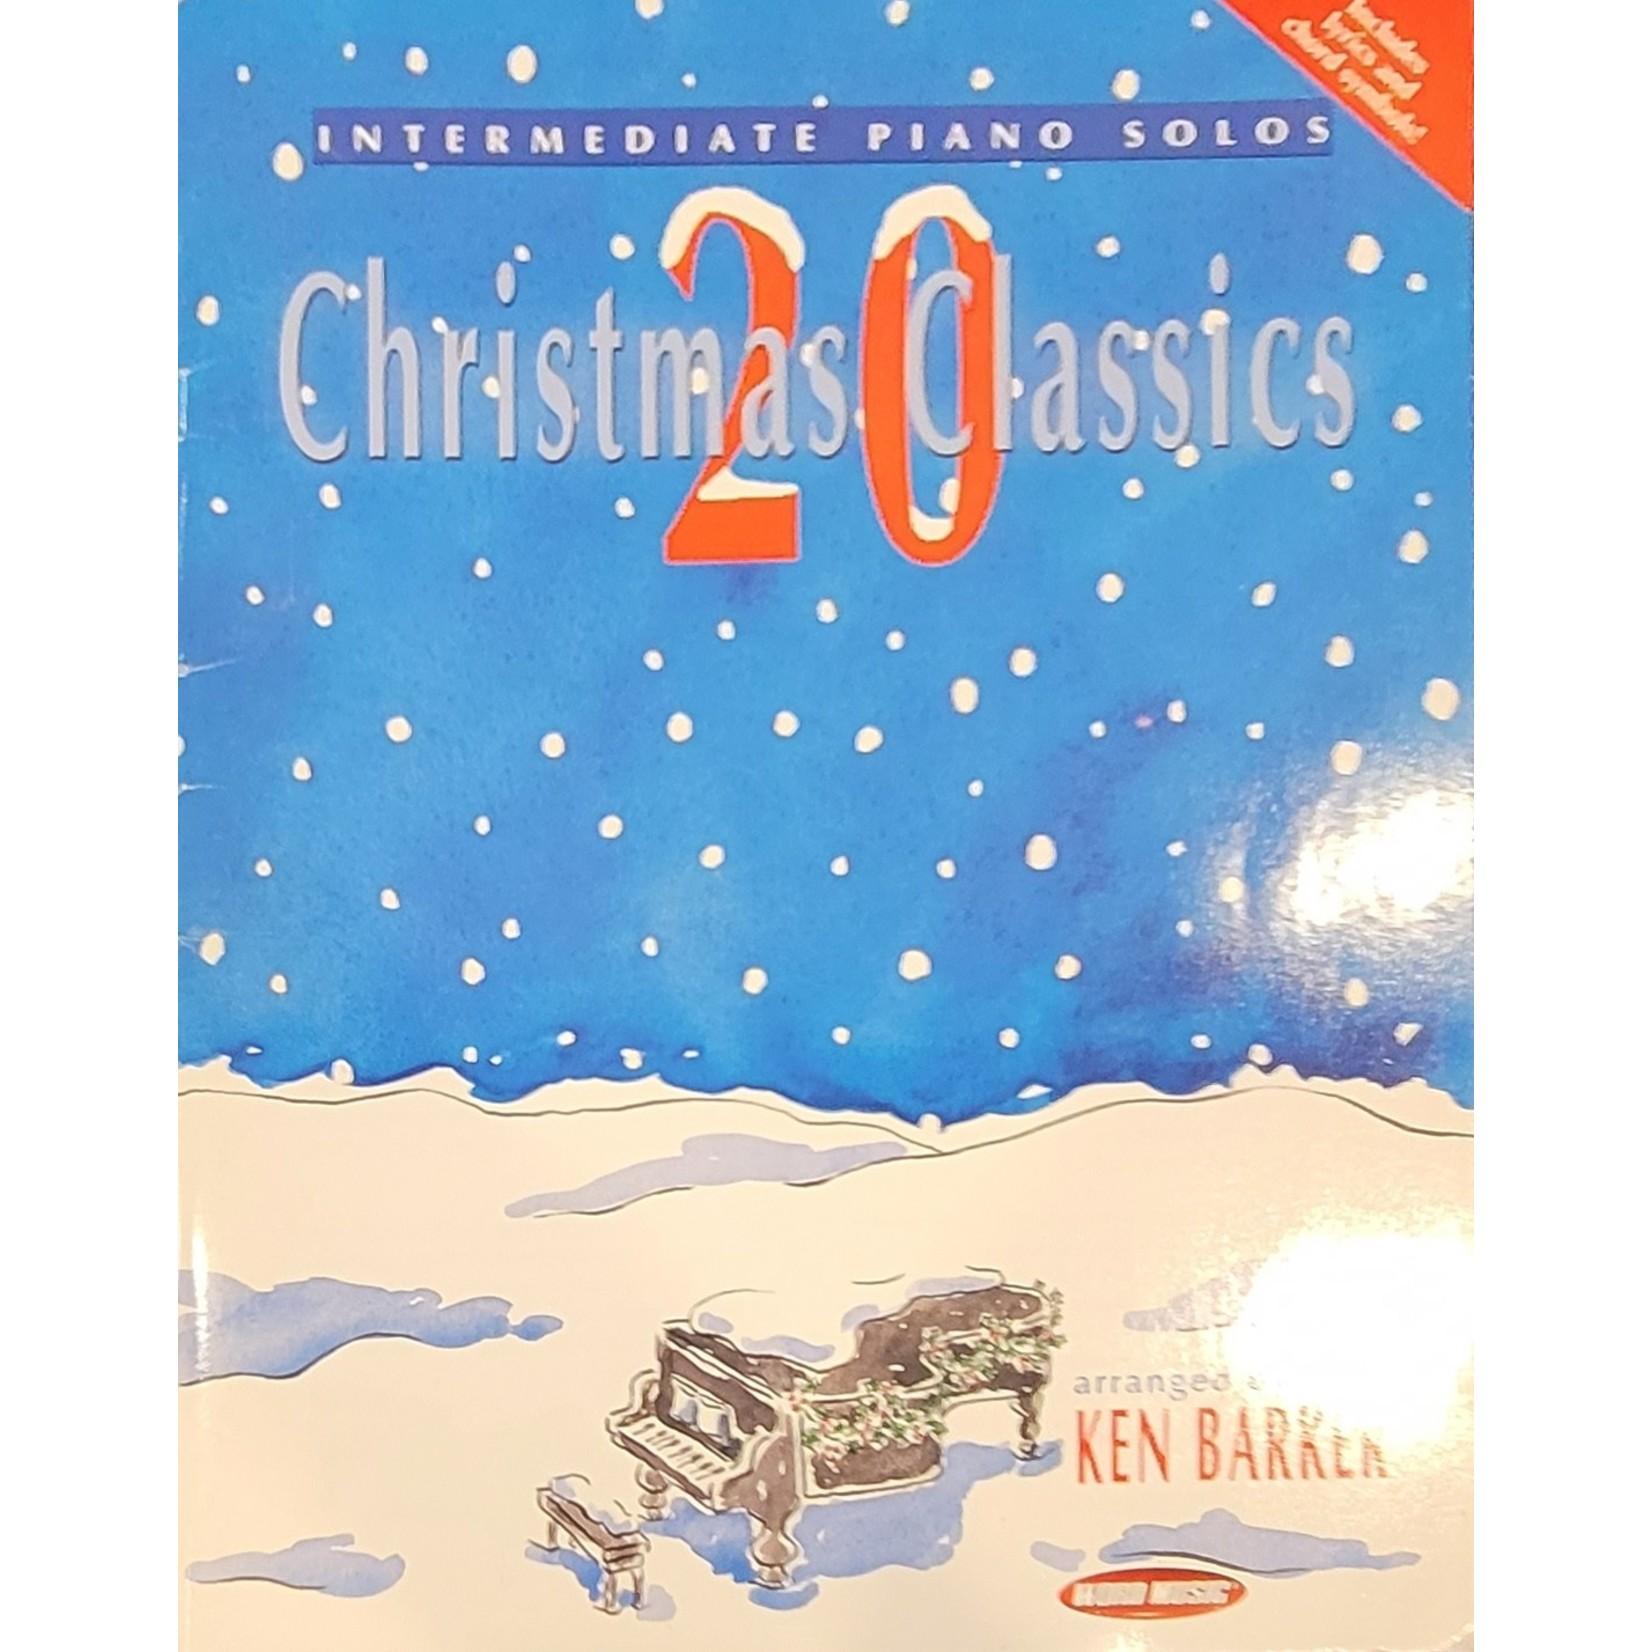 HAL LEONARD LIVRE INTERMEDIATE PIANO SOLO/ 20 CHRISTMAS CLASSICS